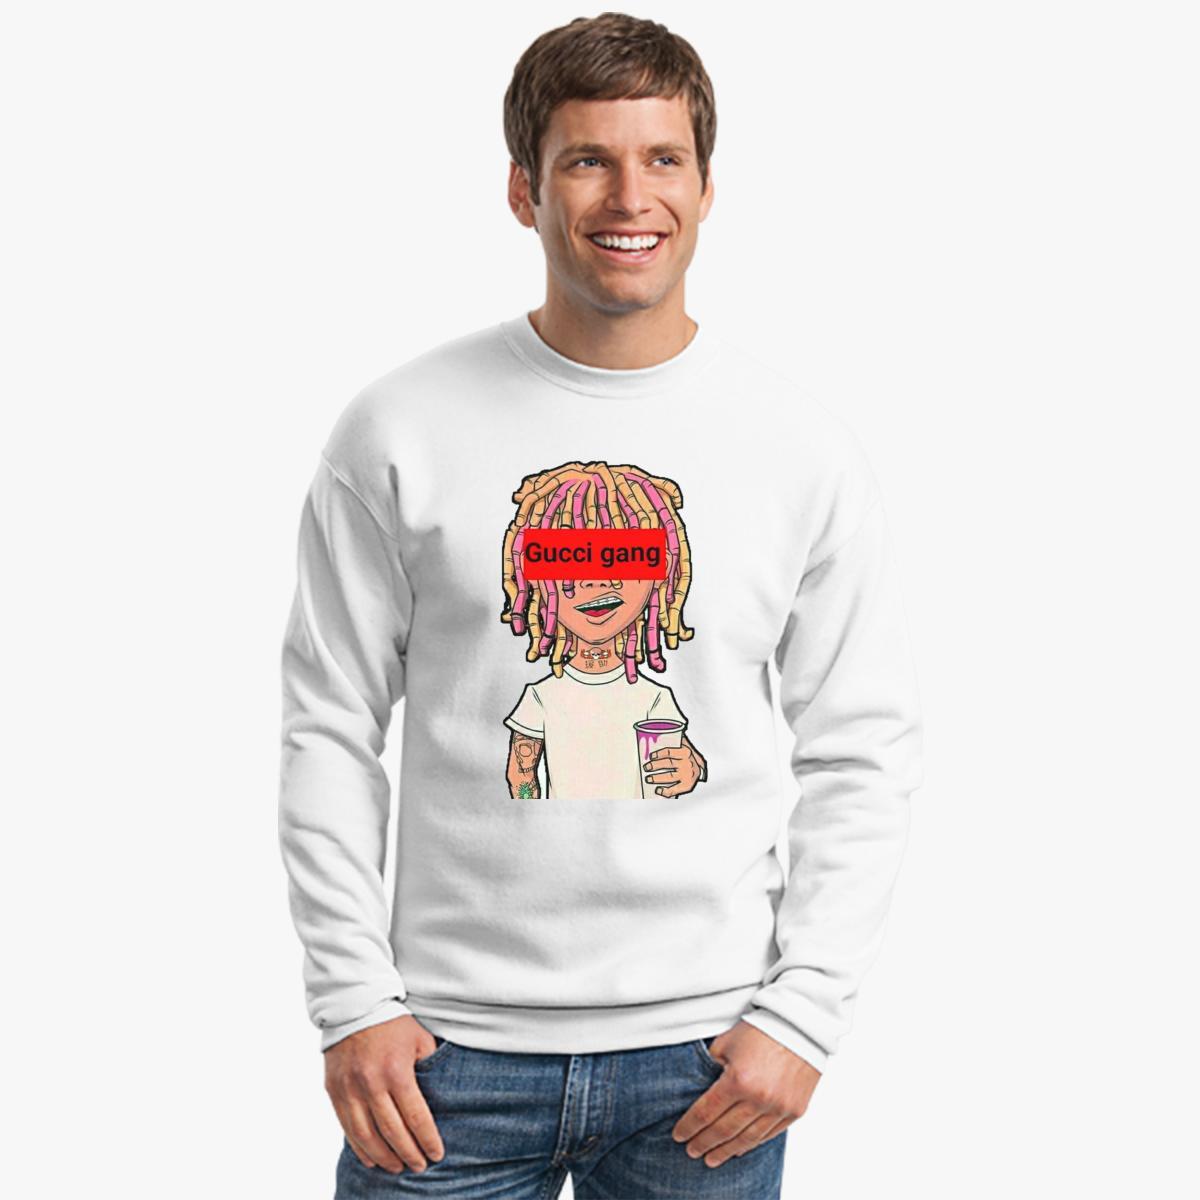 a59245380e6a Girl Gang Gucci T Shirt